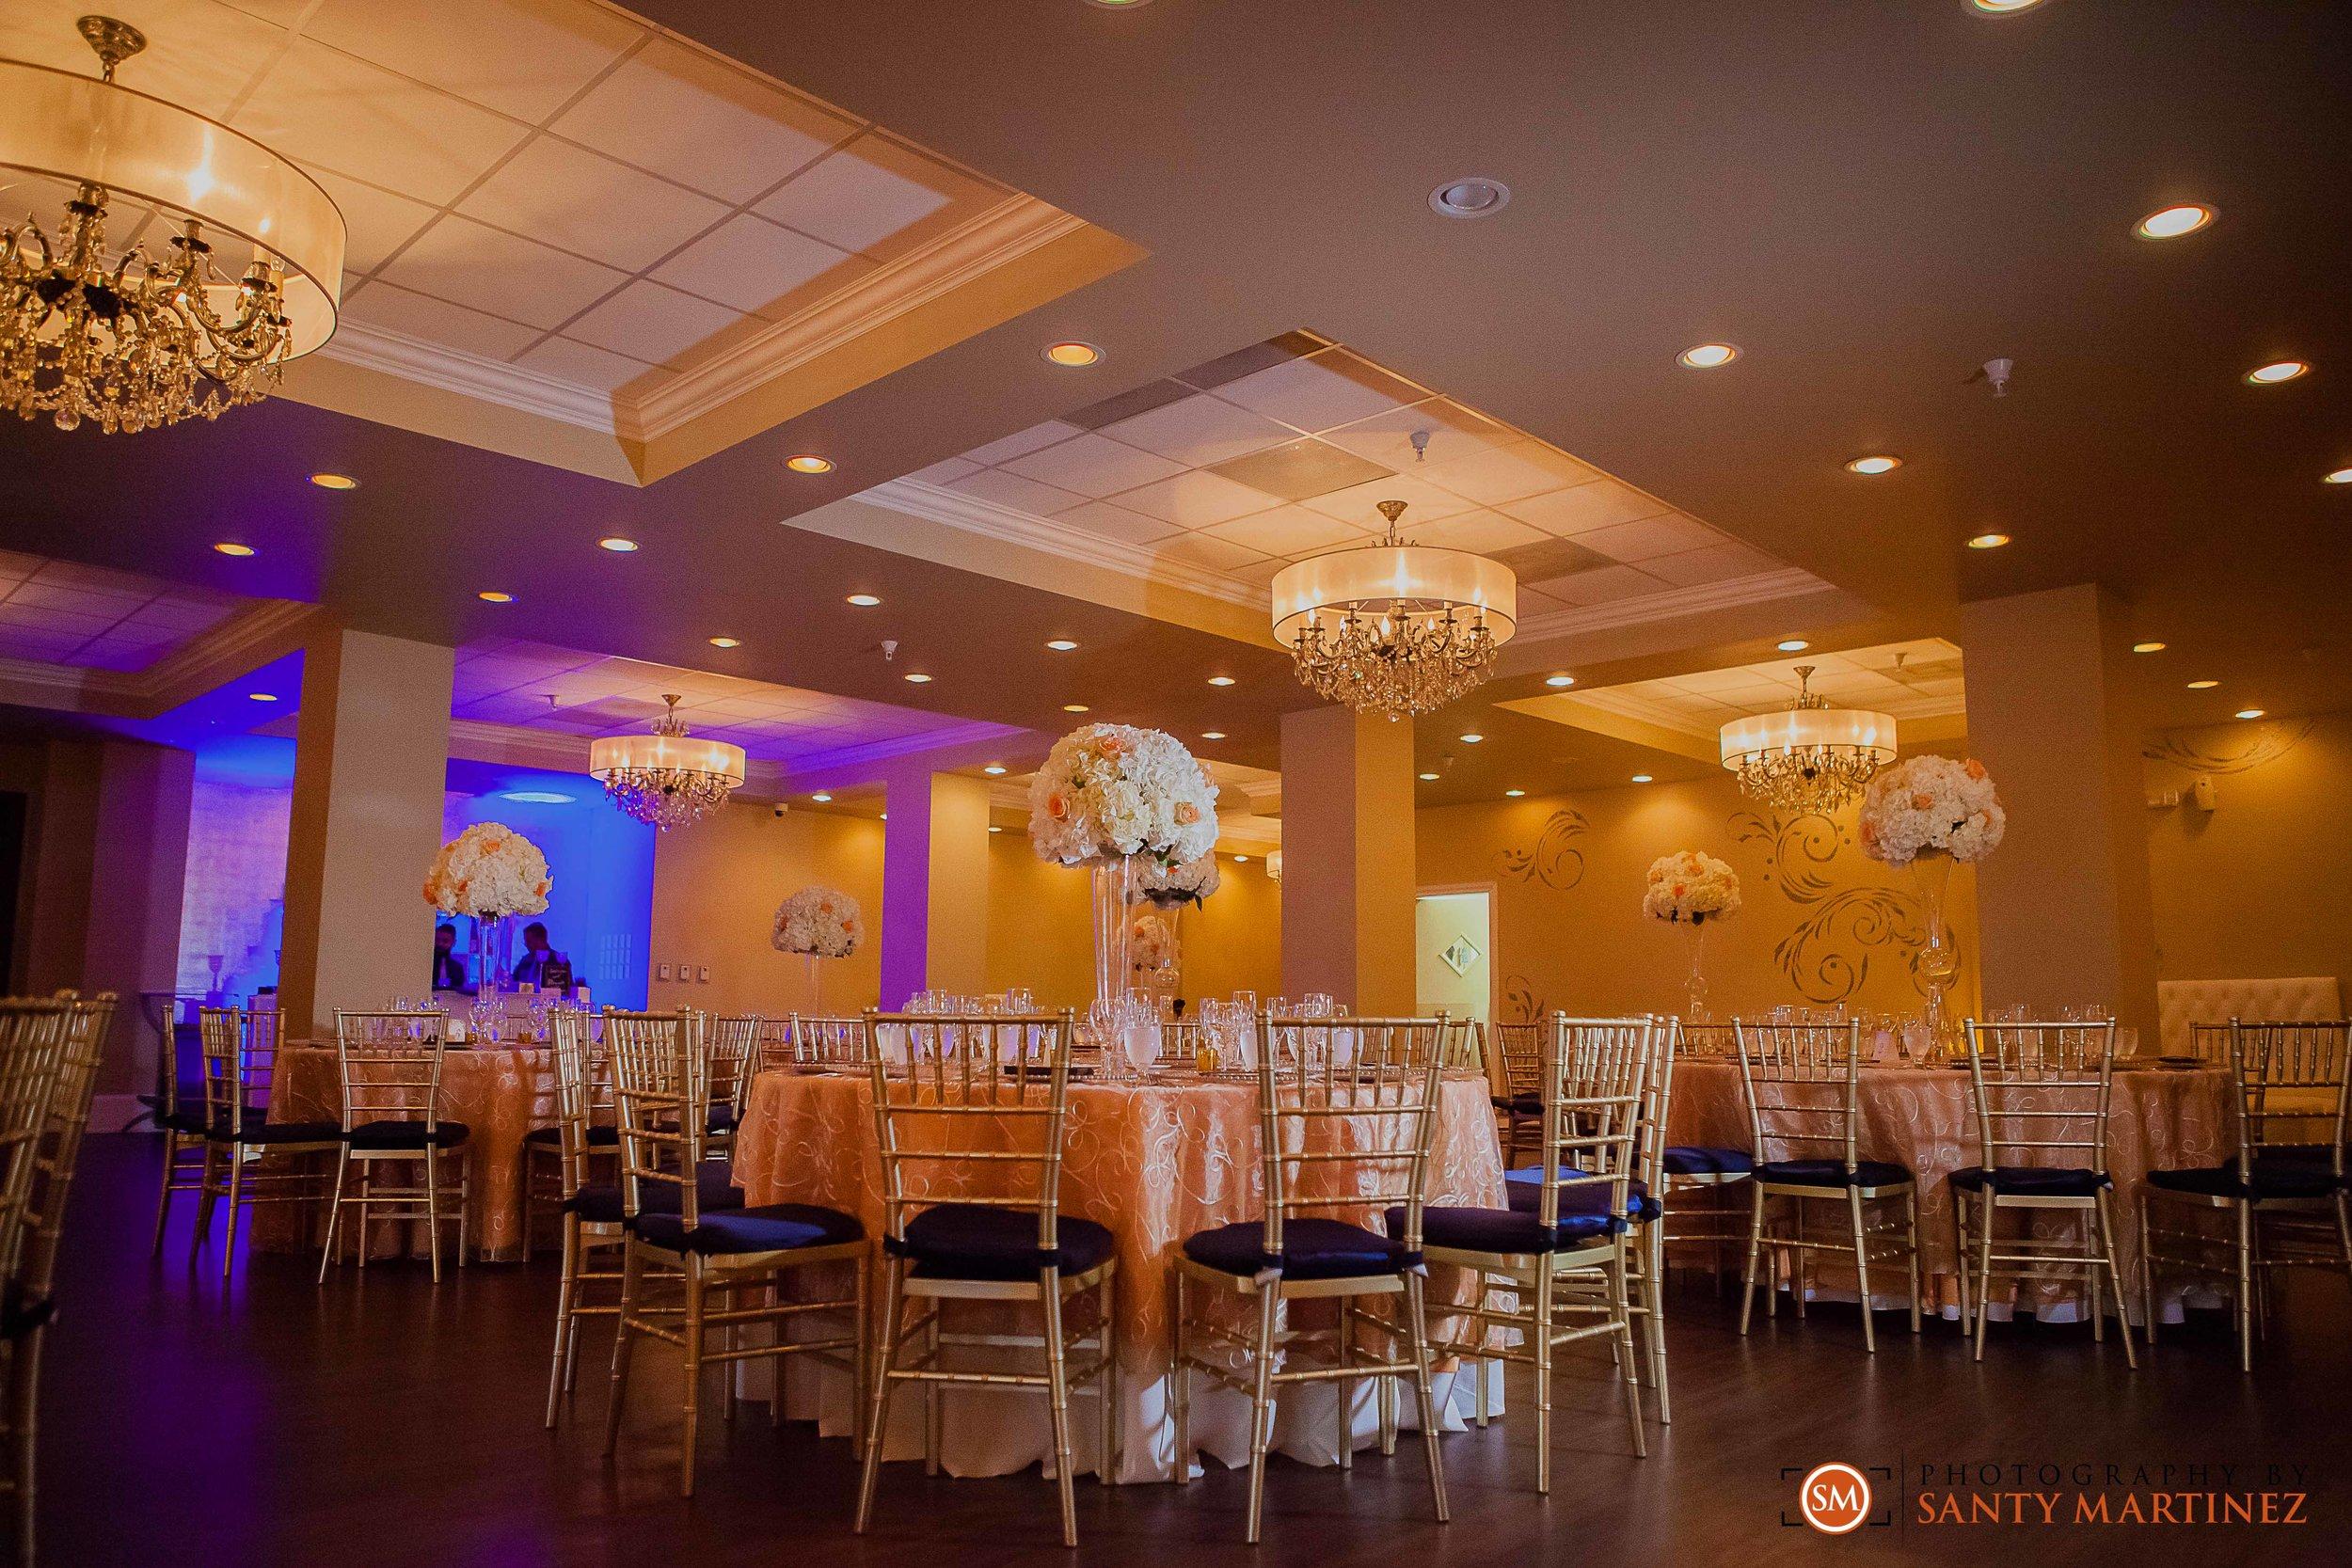 Wedding La Jolla Ballroom - Photography by Santy Martinez-37.jpg